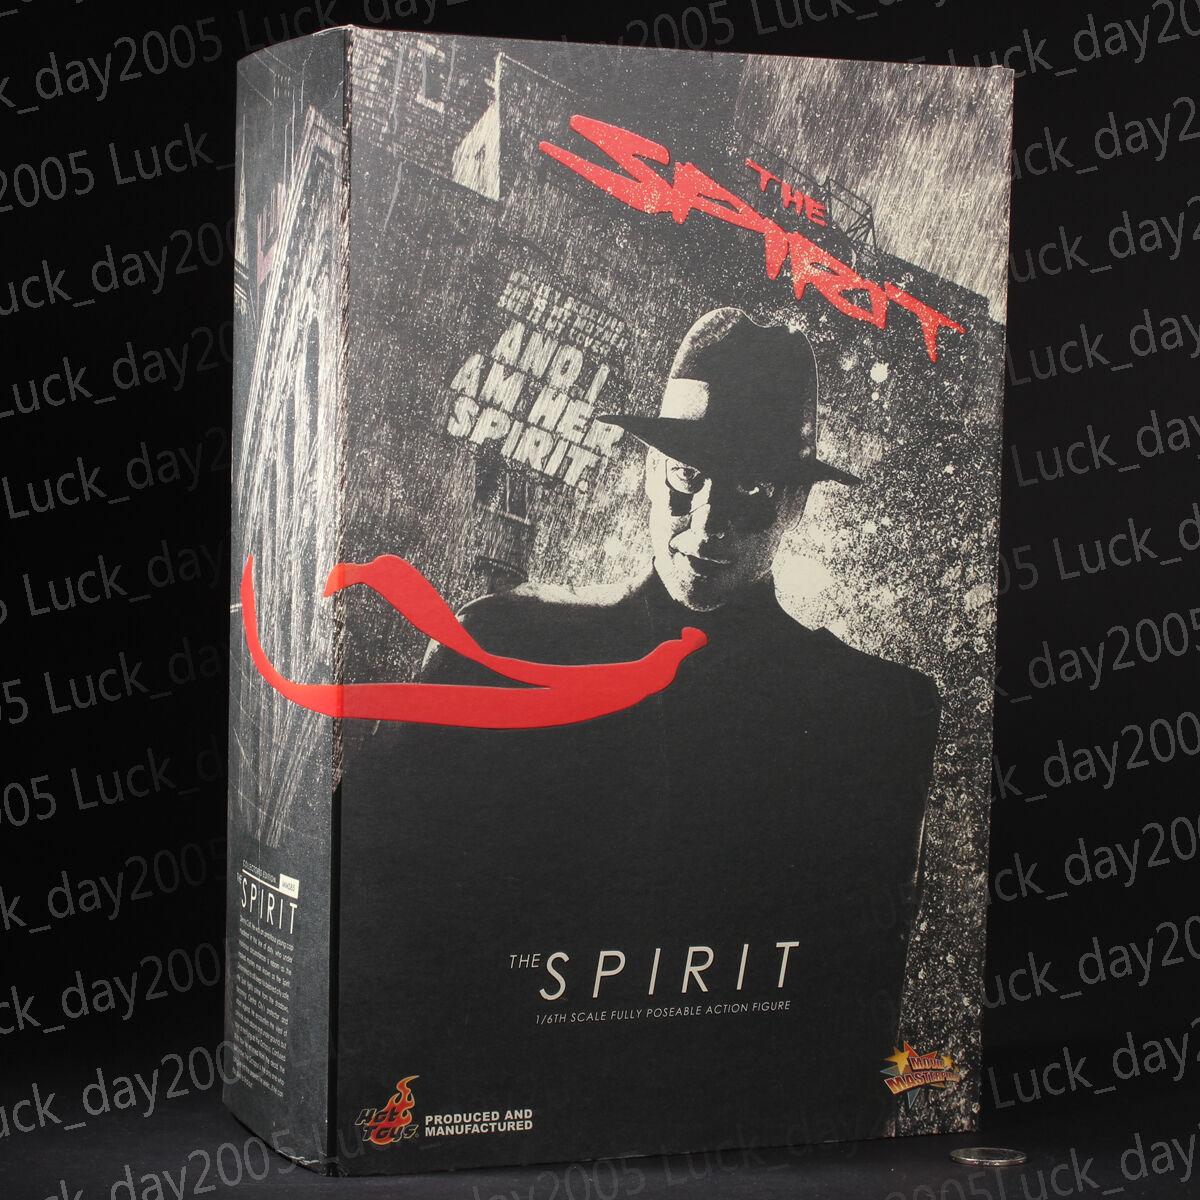 HOT TOYS SPIRIT Gabriel Macht 1/6 Figure